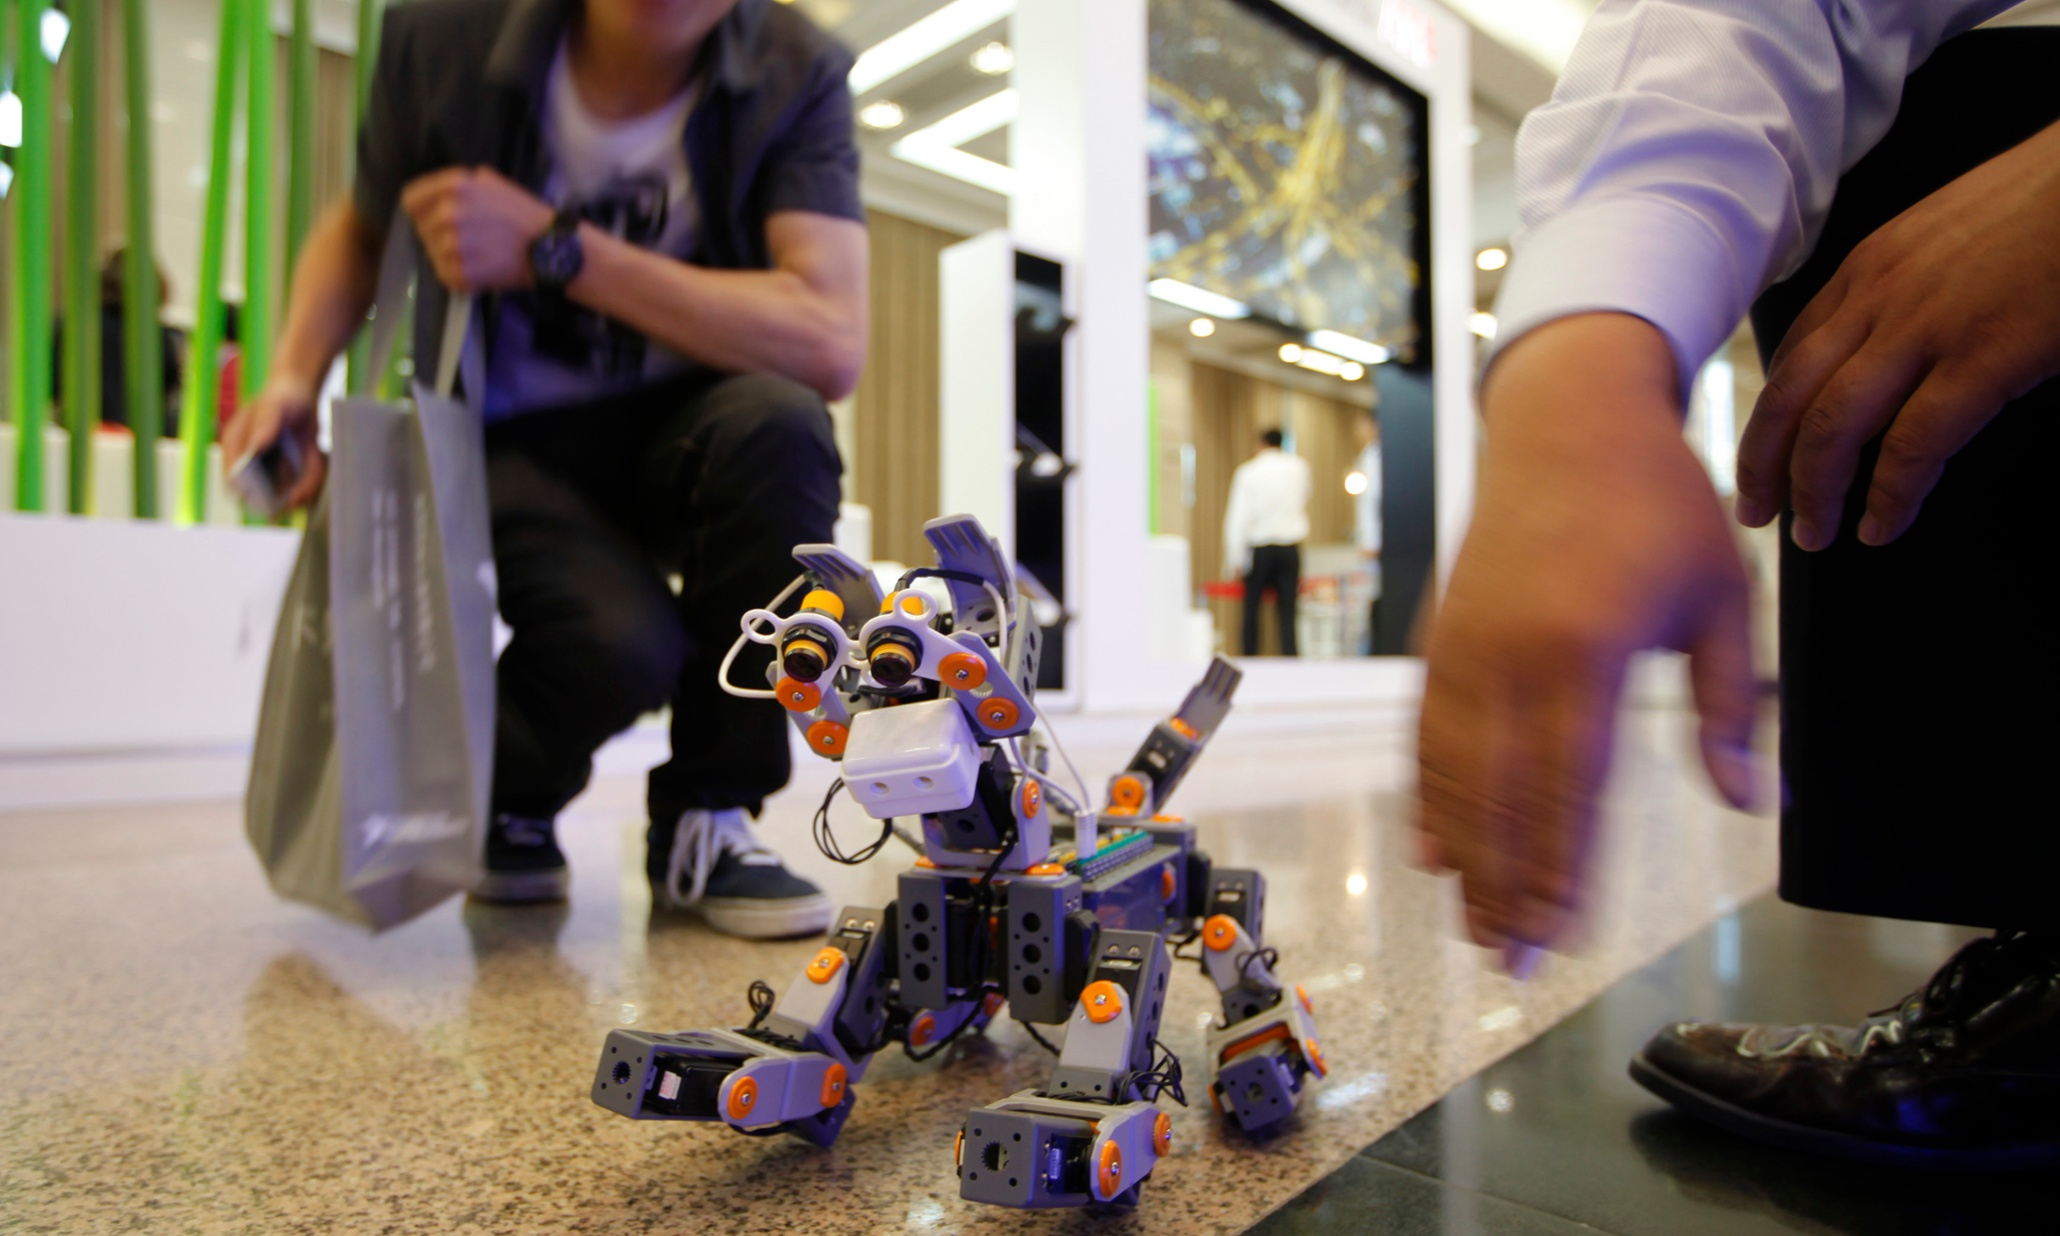 Apple co-founder Steve Wozniak says humans will be robots' pets